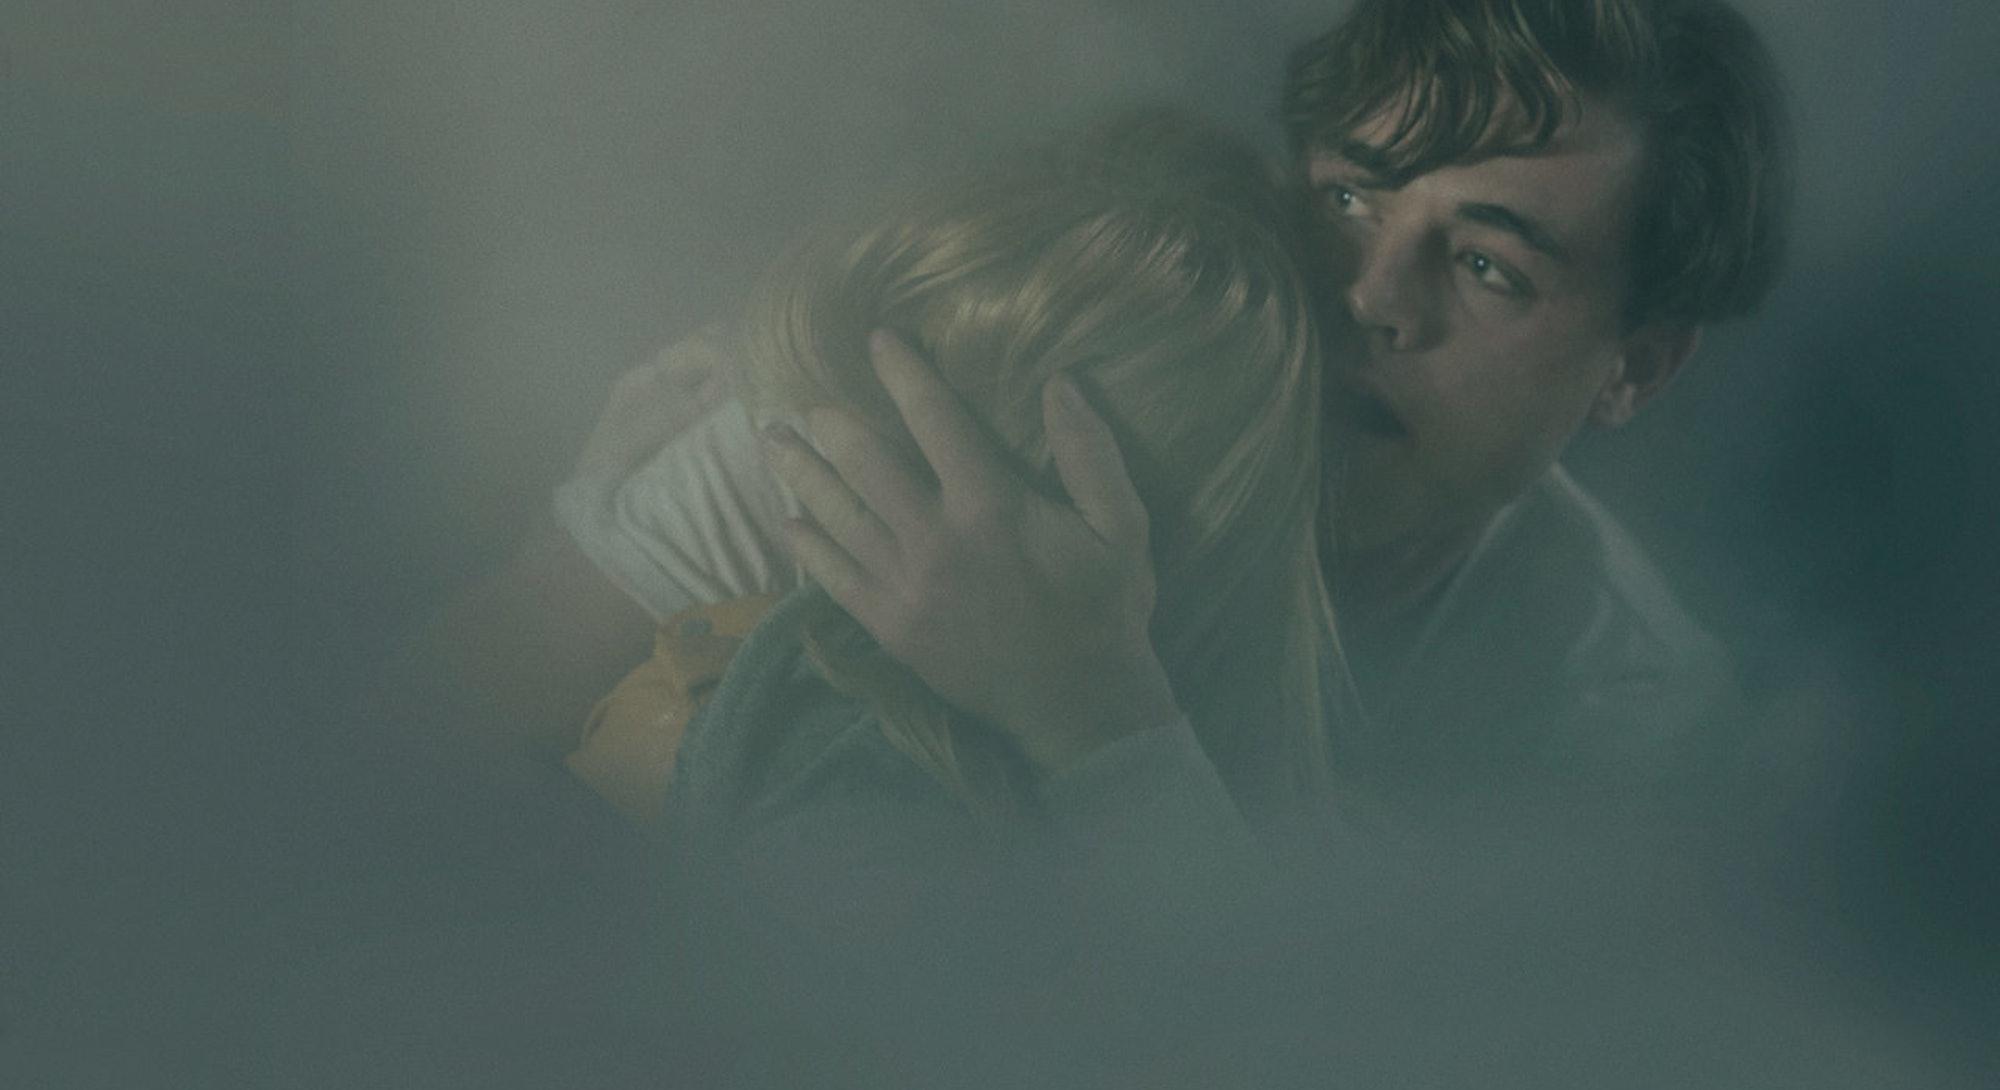 screenshot from The Mist TV show Season 1 on Netflix